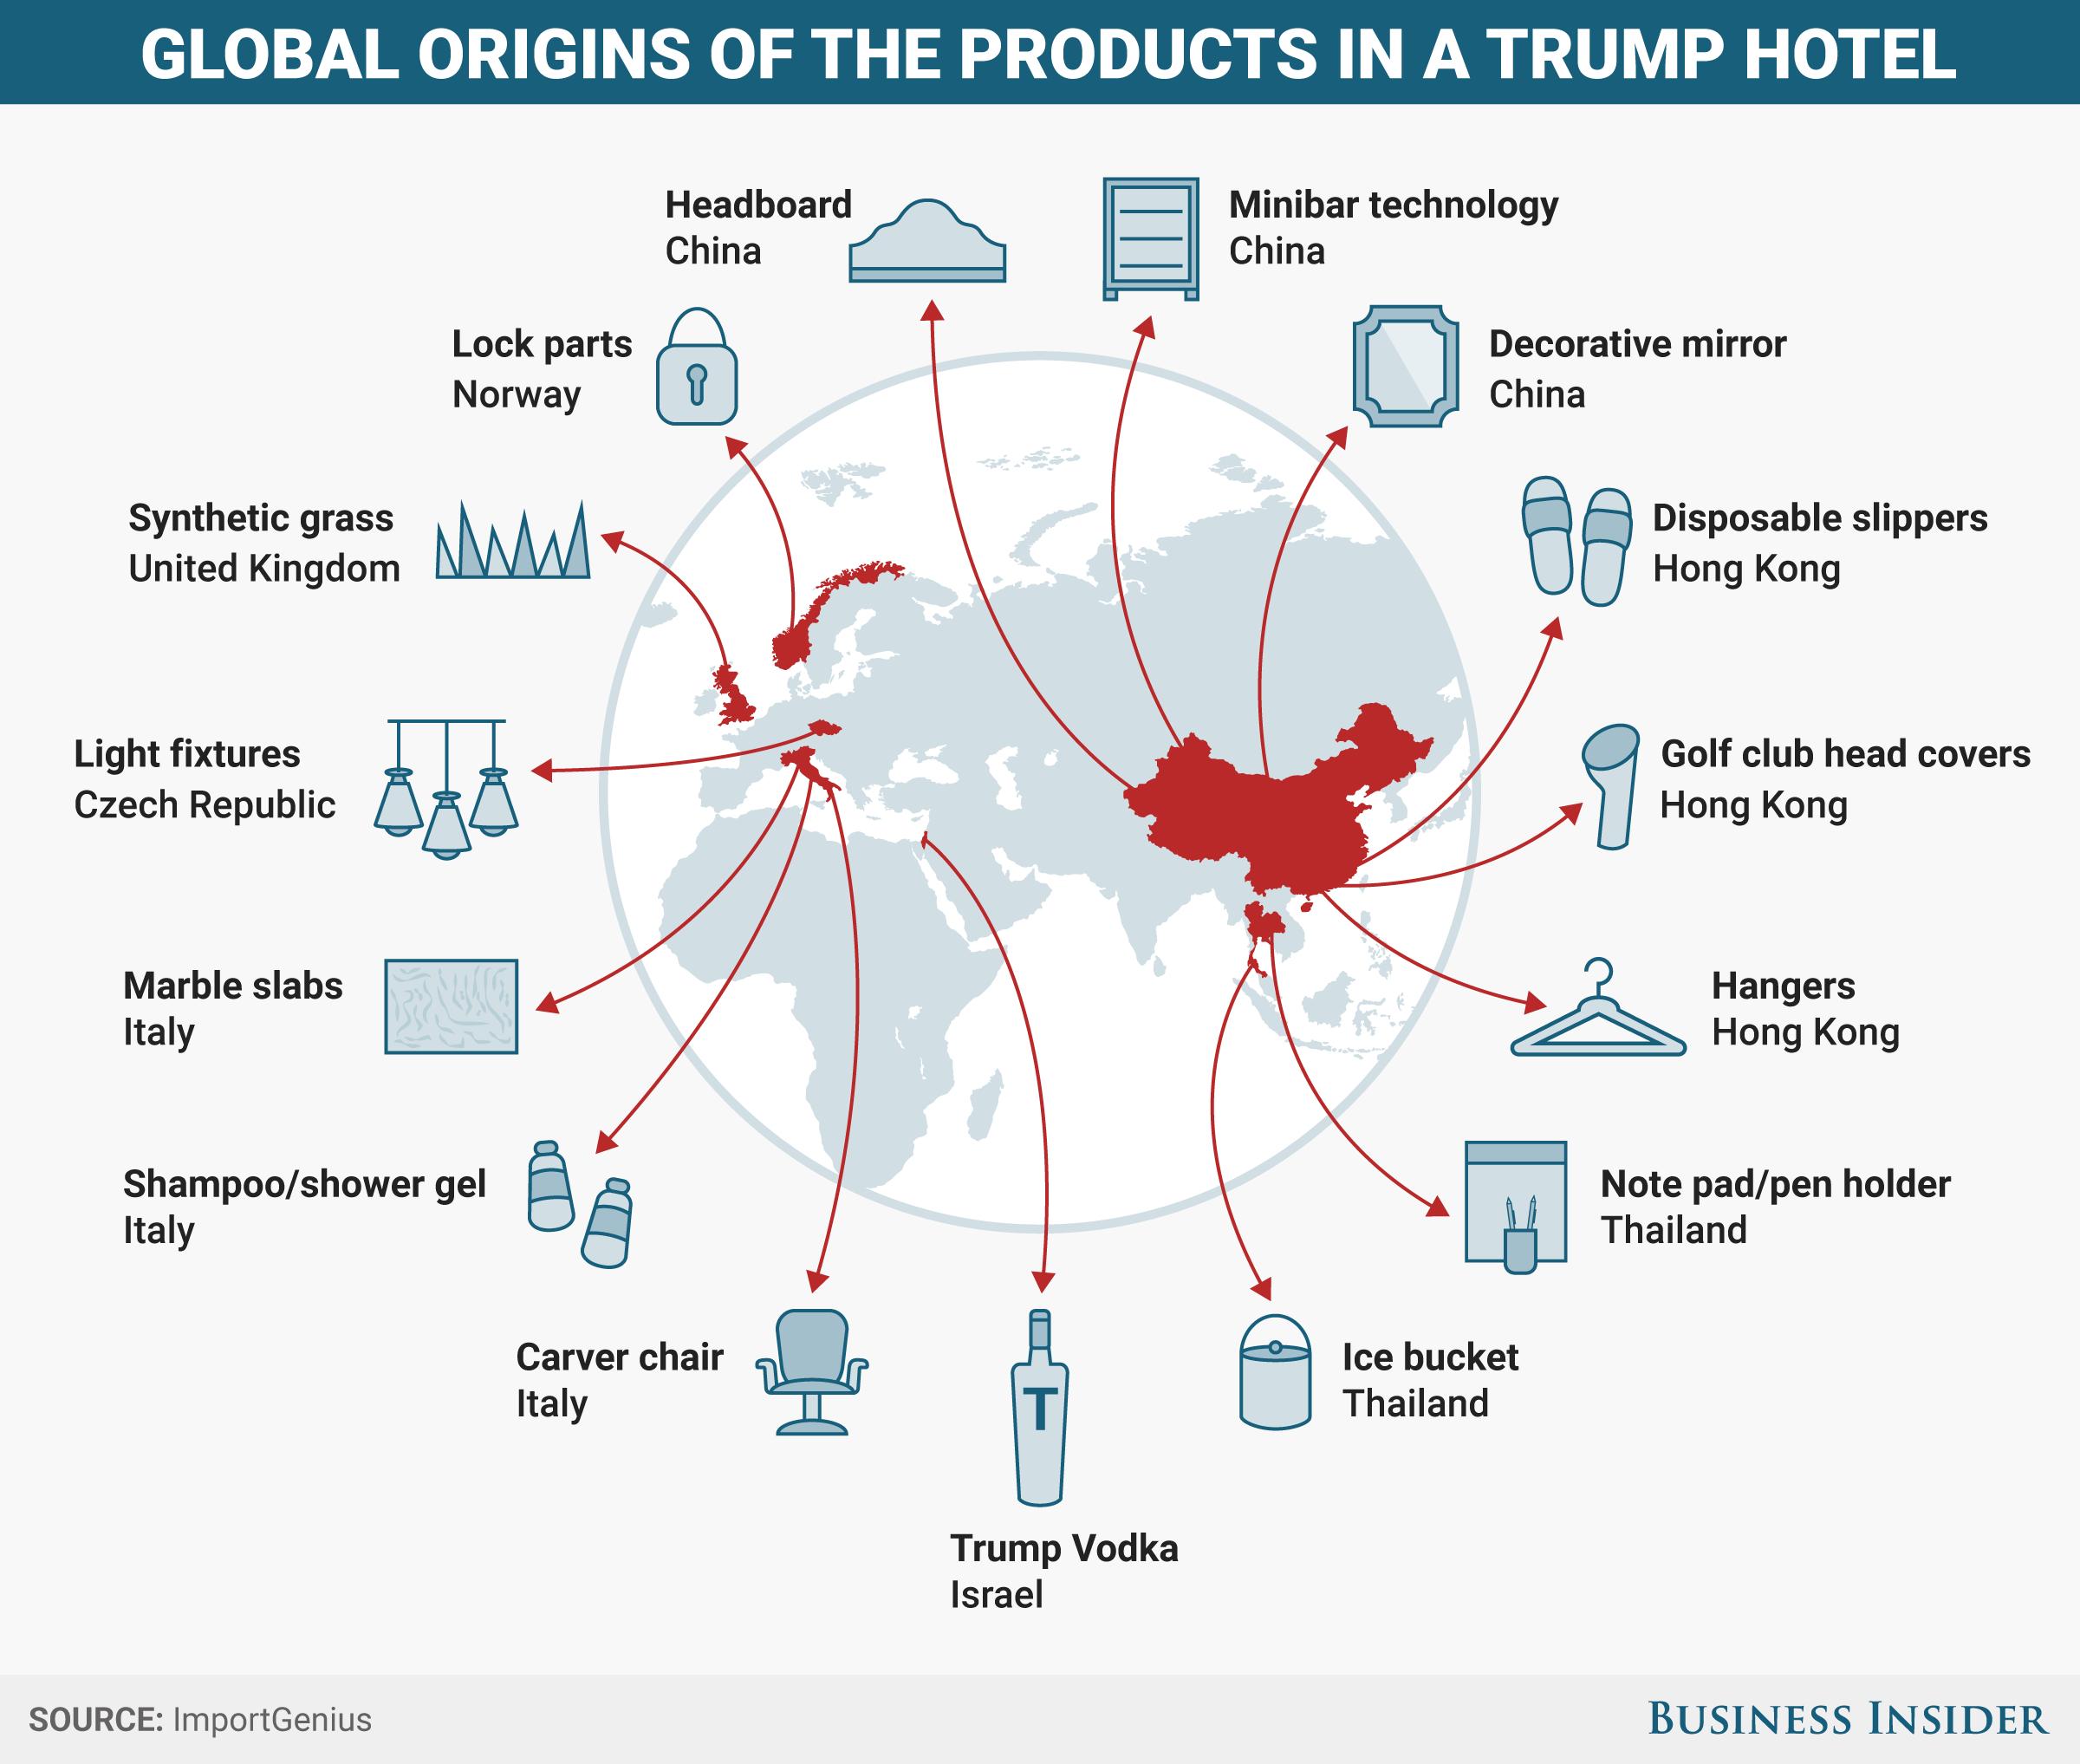 The Global Origins of Donald Trump's Hotel